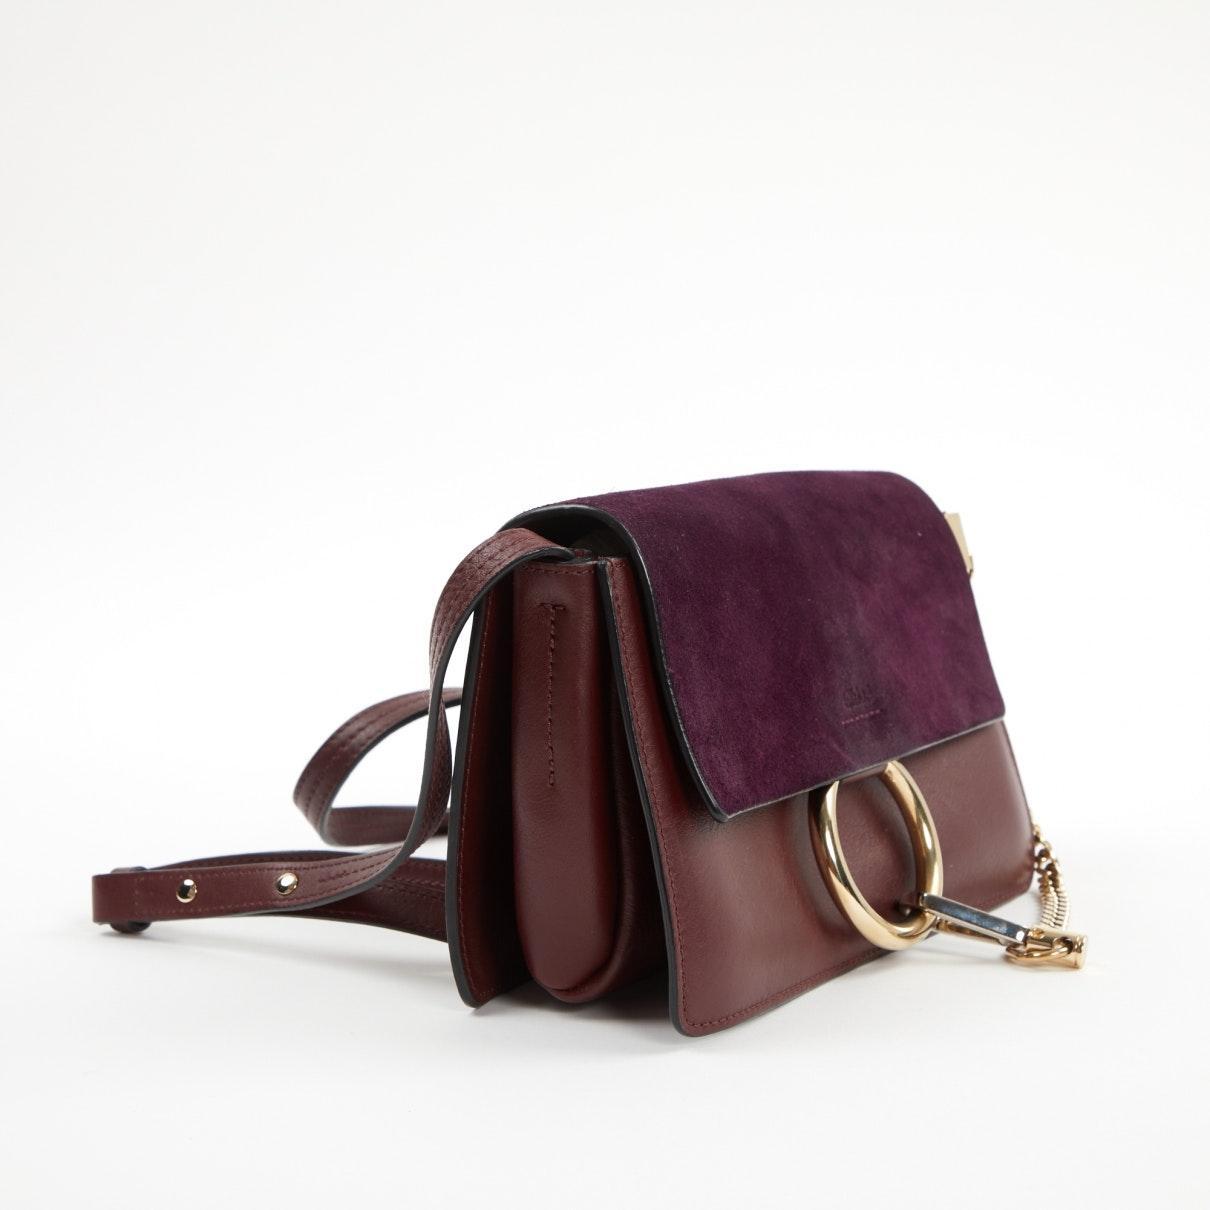 Sacs à main Faye Chloé en coloris Violet 5Xa7